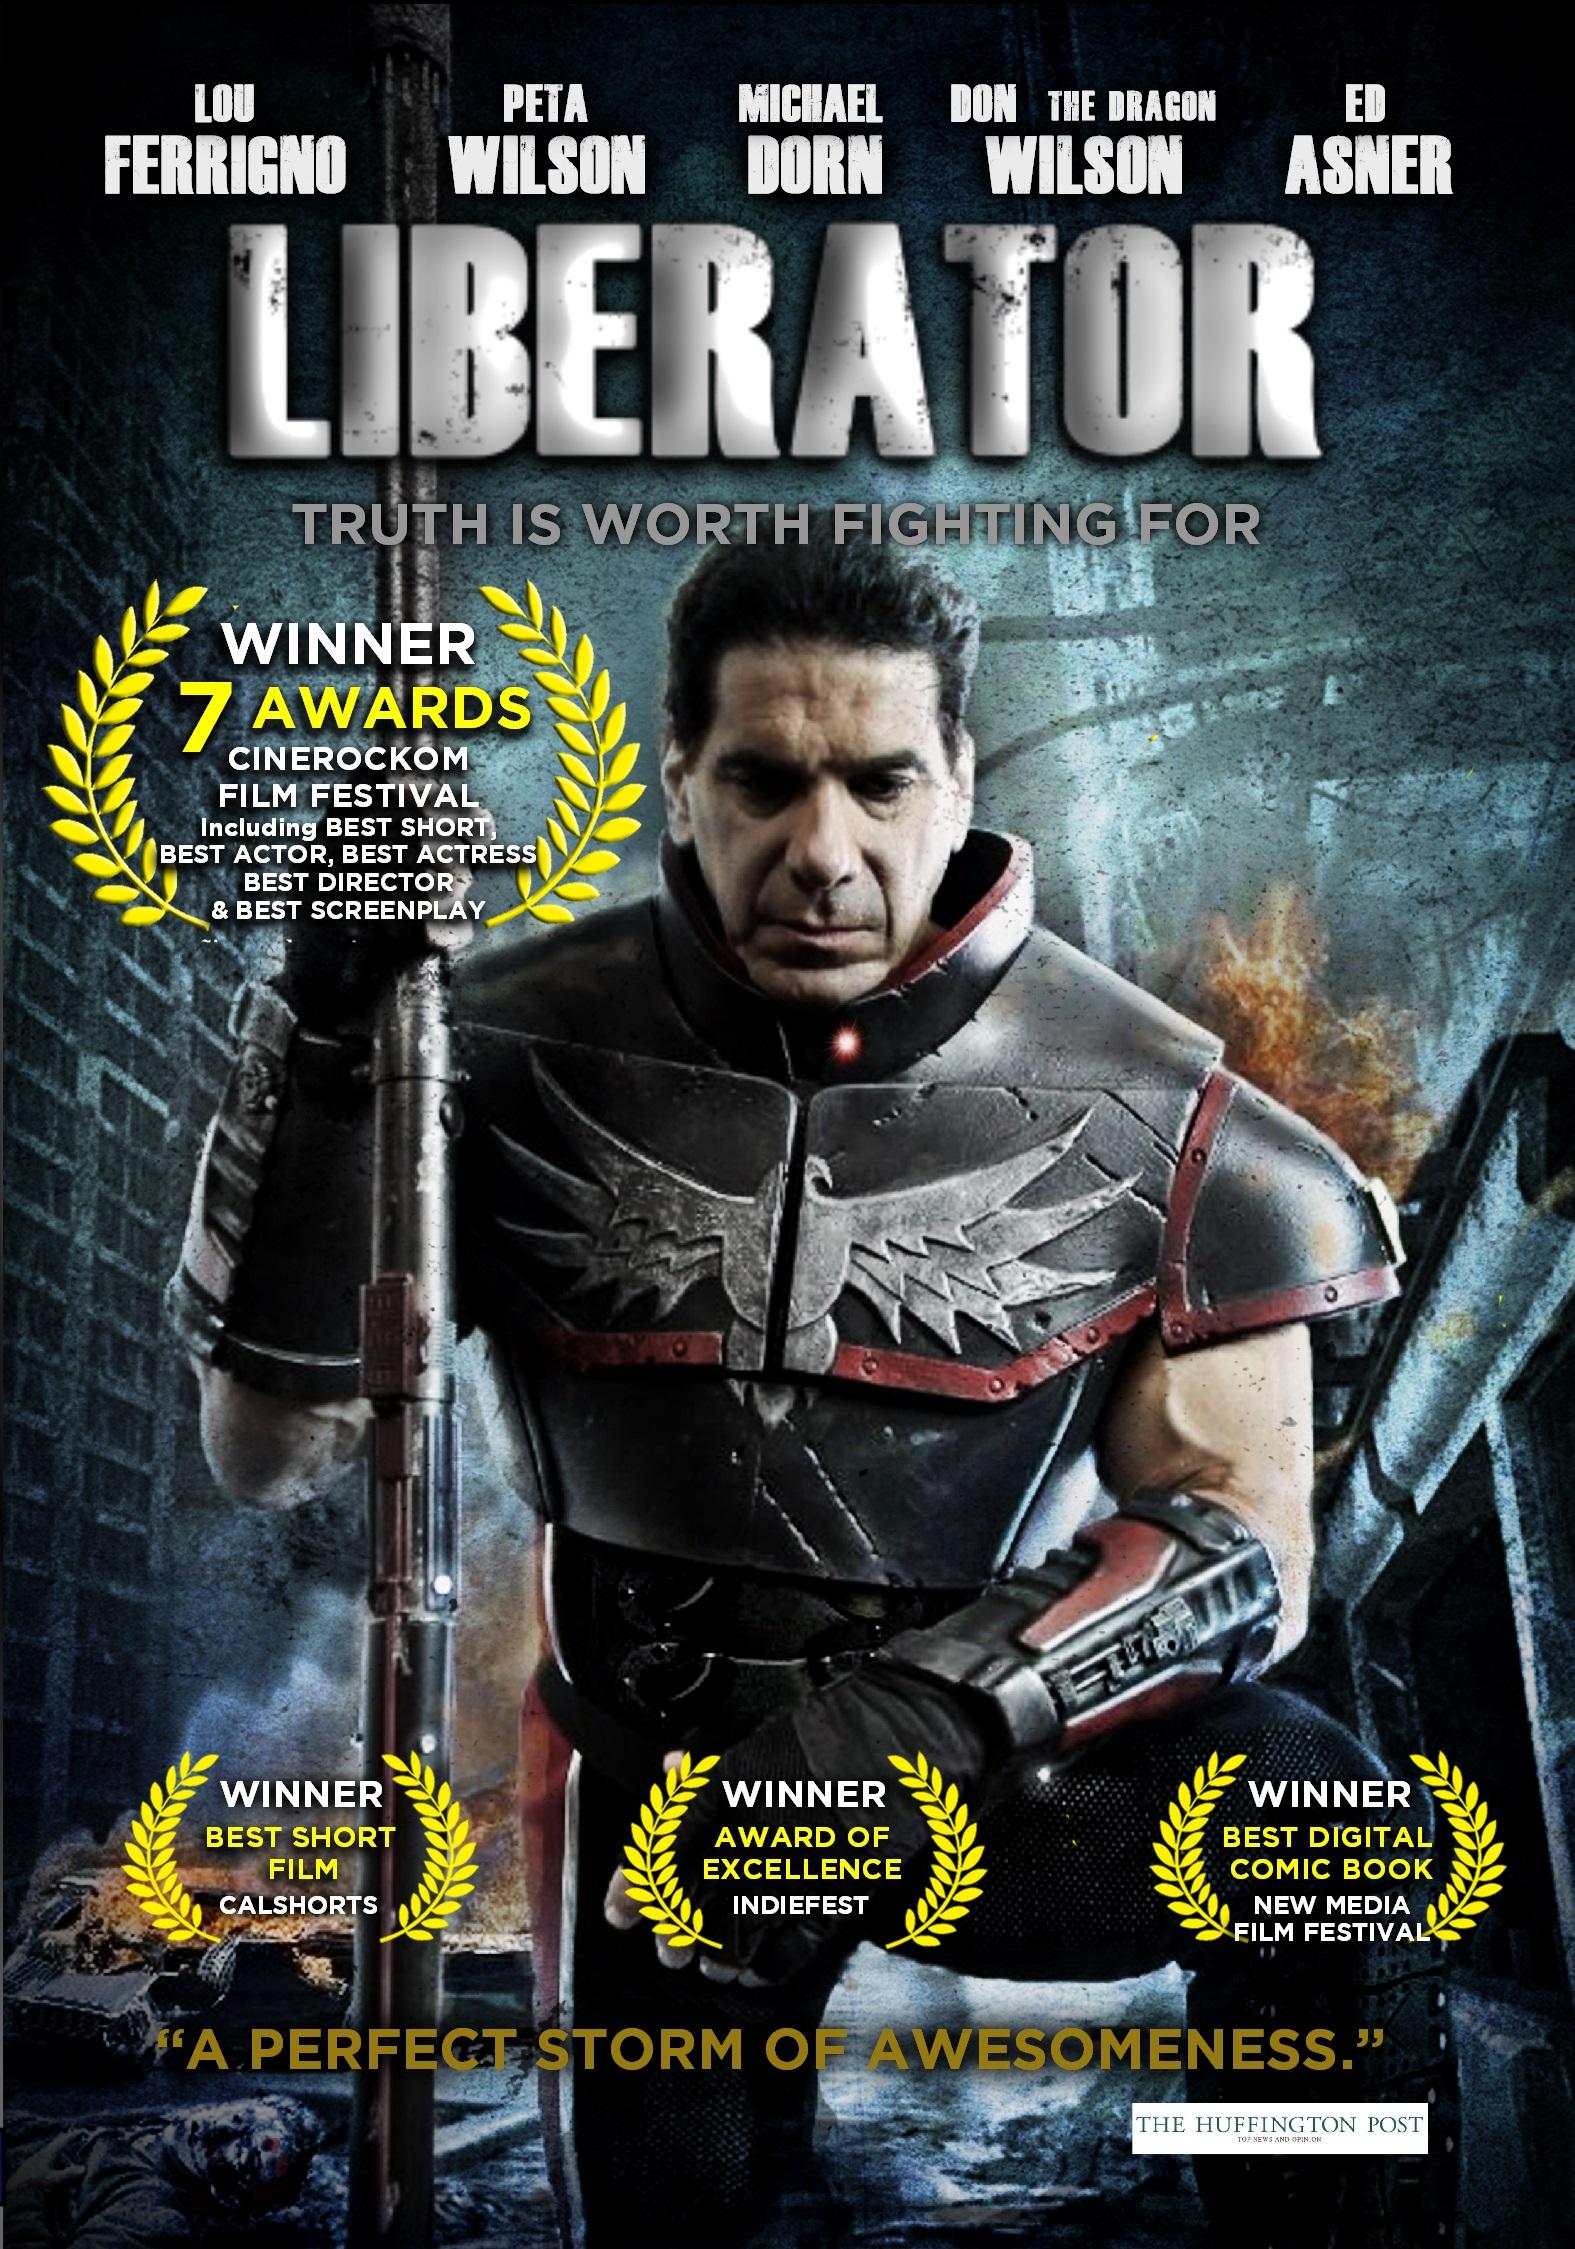 liberator-image.jpg